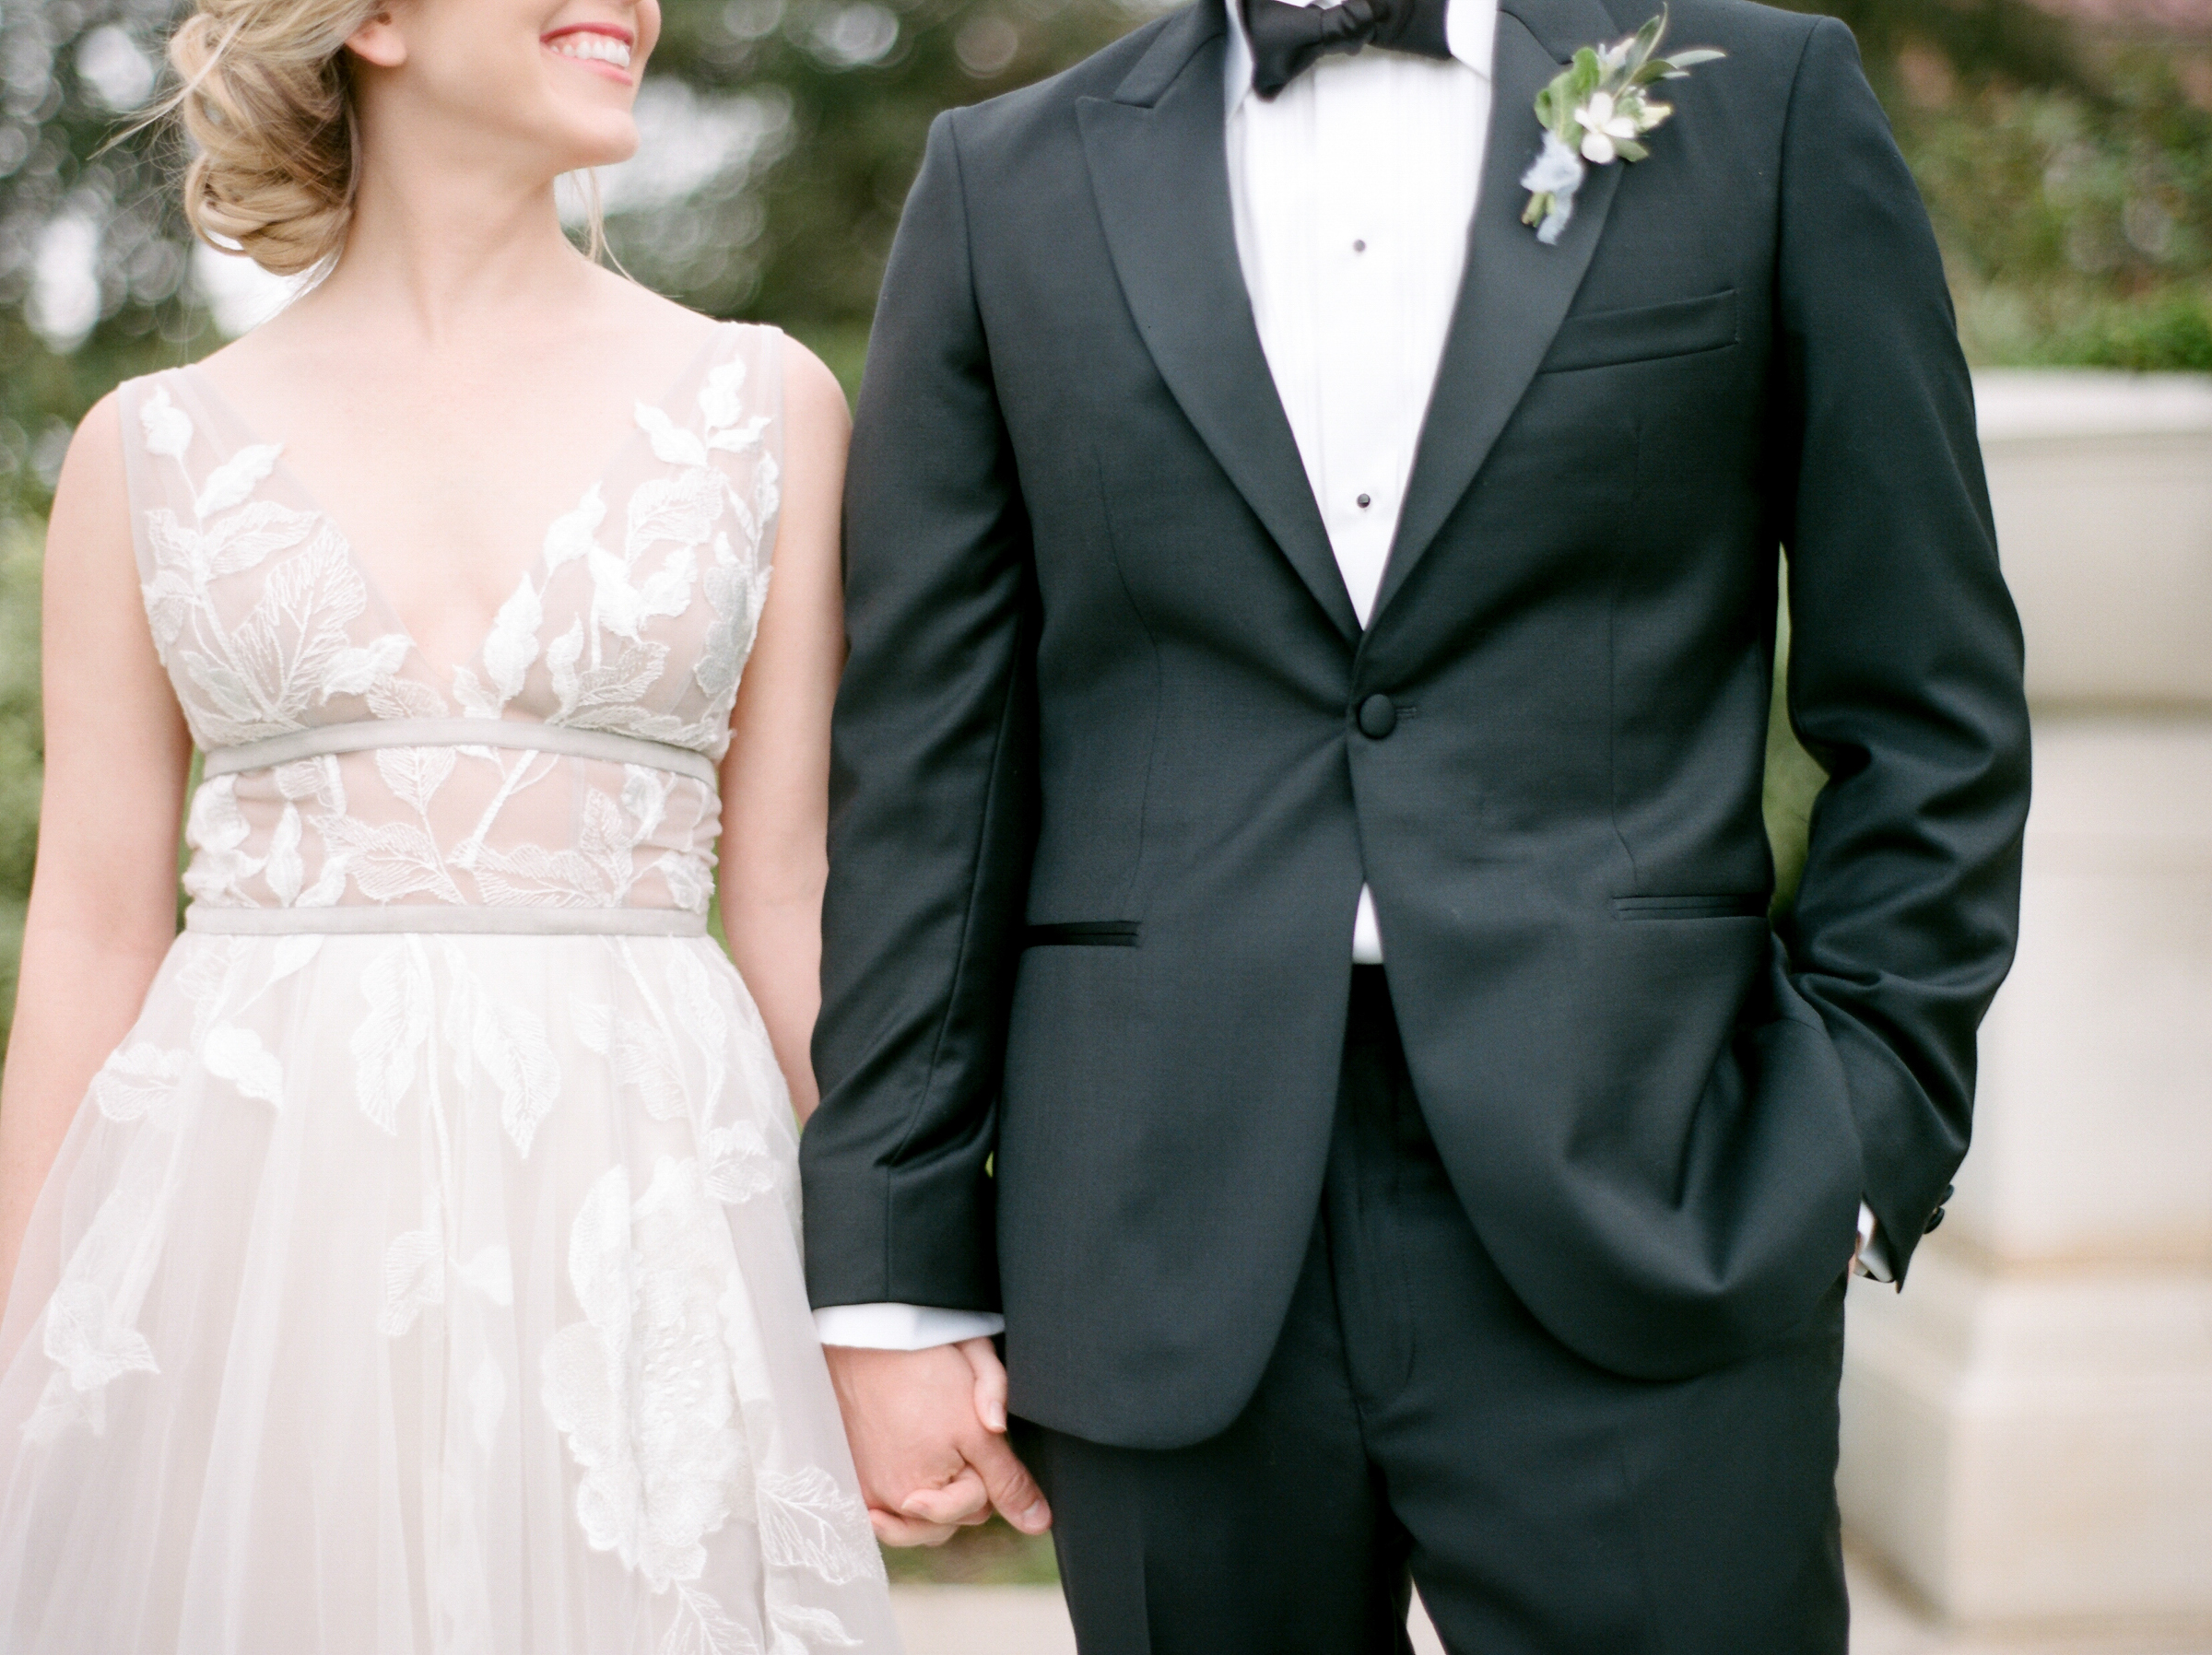 McGovern-Centennial-Gardens-Houston-Texas-Wedding-Venue-Josh-Dana-Fernandez-Photography-Film-Destination-Fine-Art-Luxury-Top-Best-Austin-Dallas-Magnolia-Rouge-Jennifer-Laura-Design-4.jpg